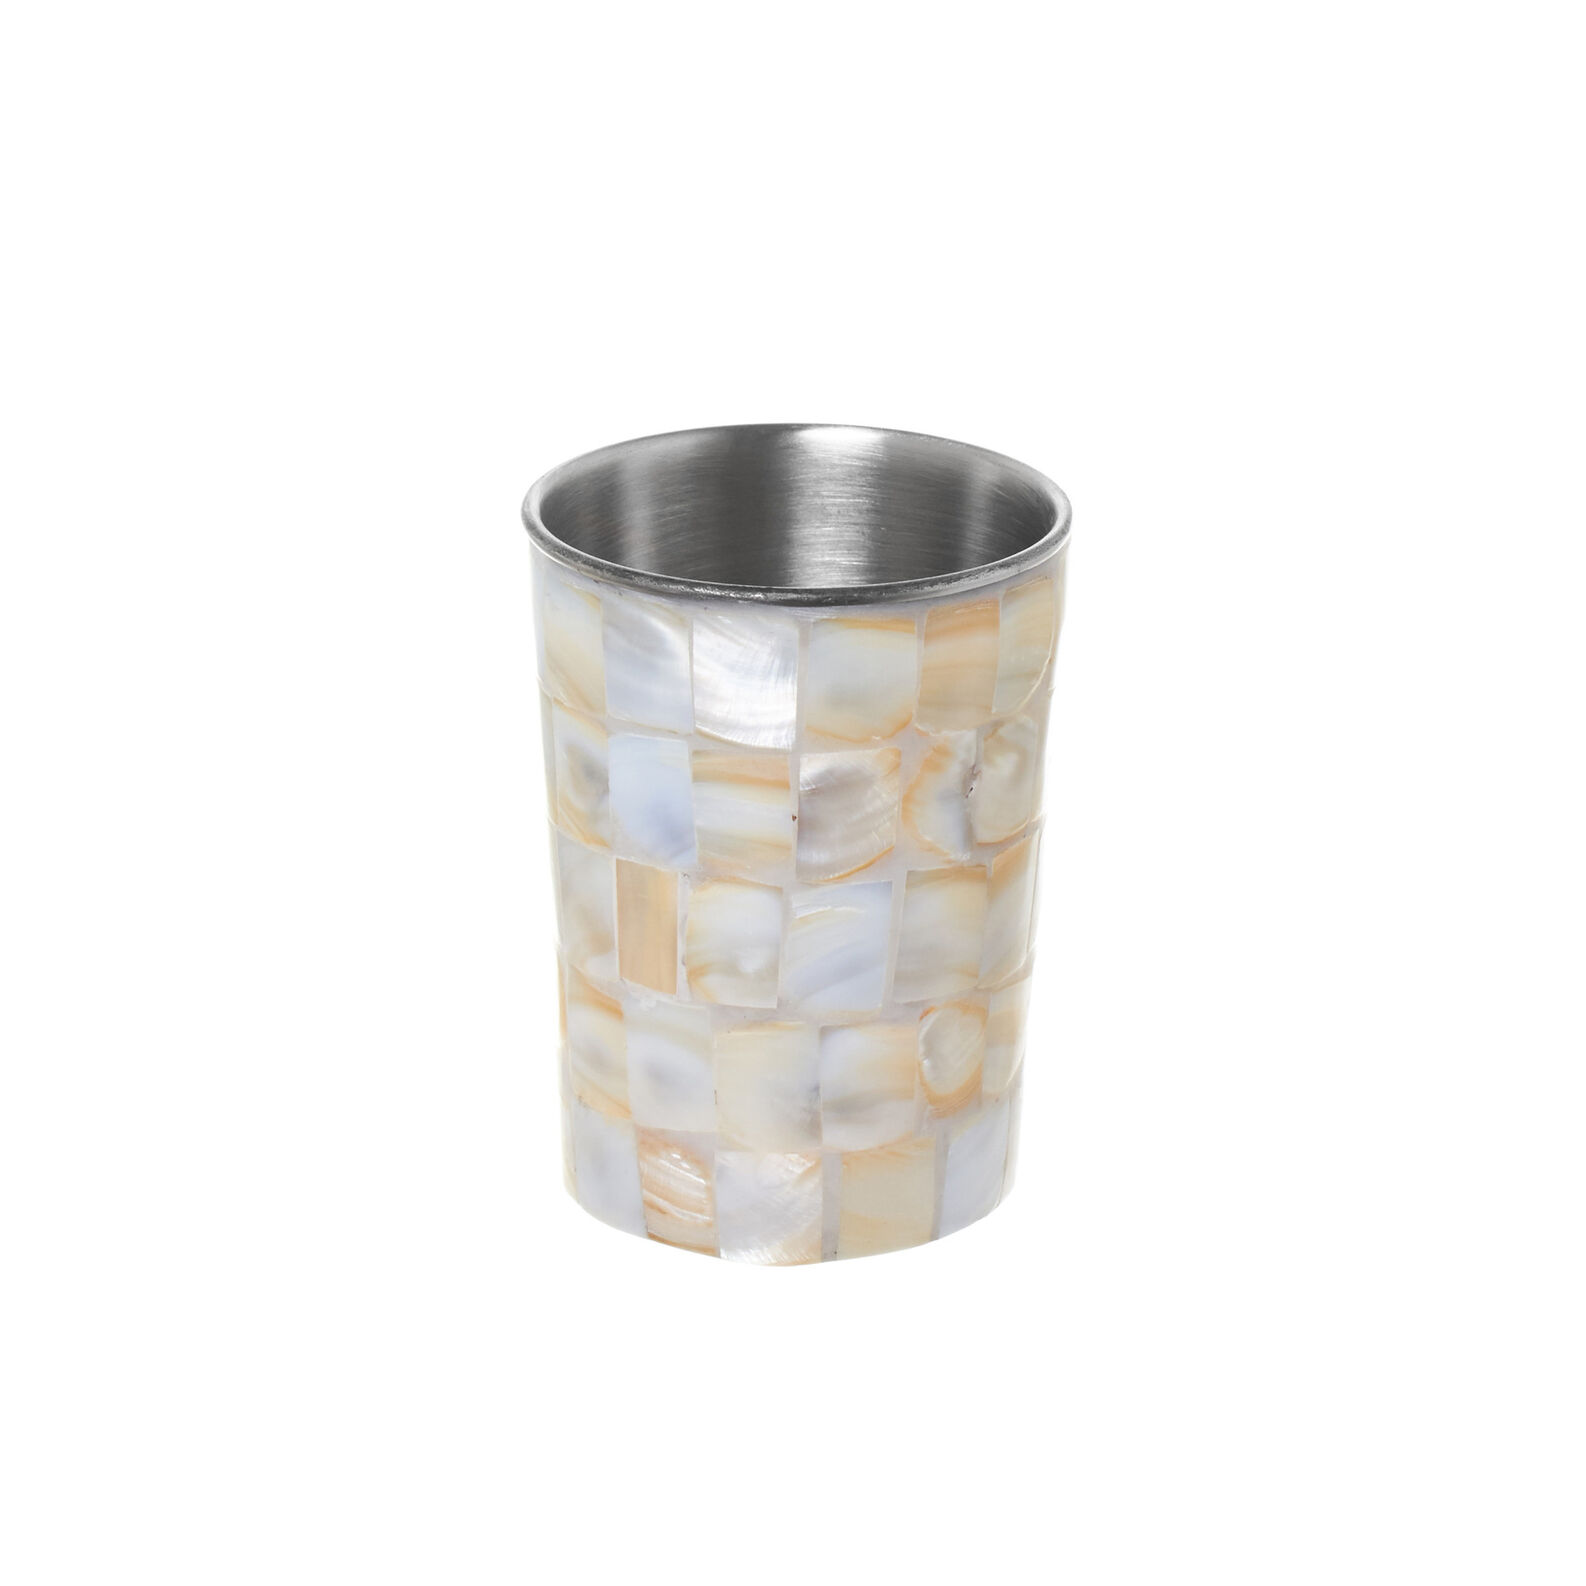 Portaspazzolino mosaico in madreperla - coincasa